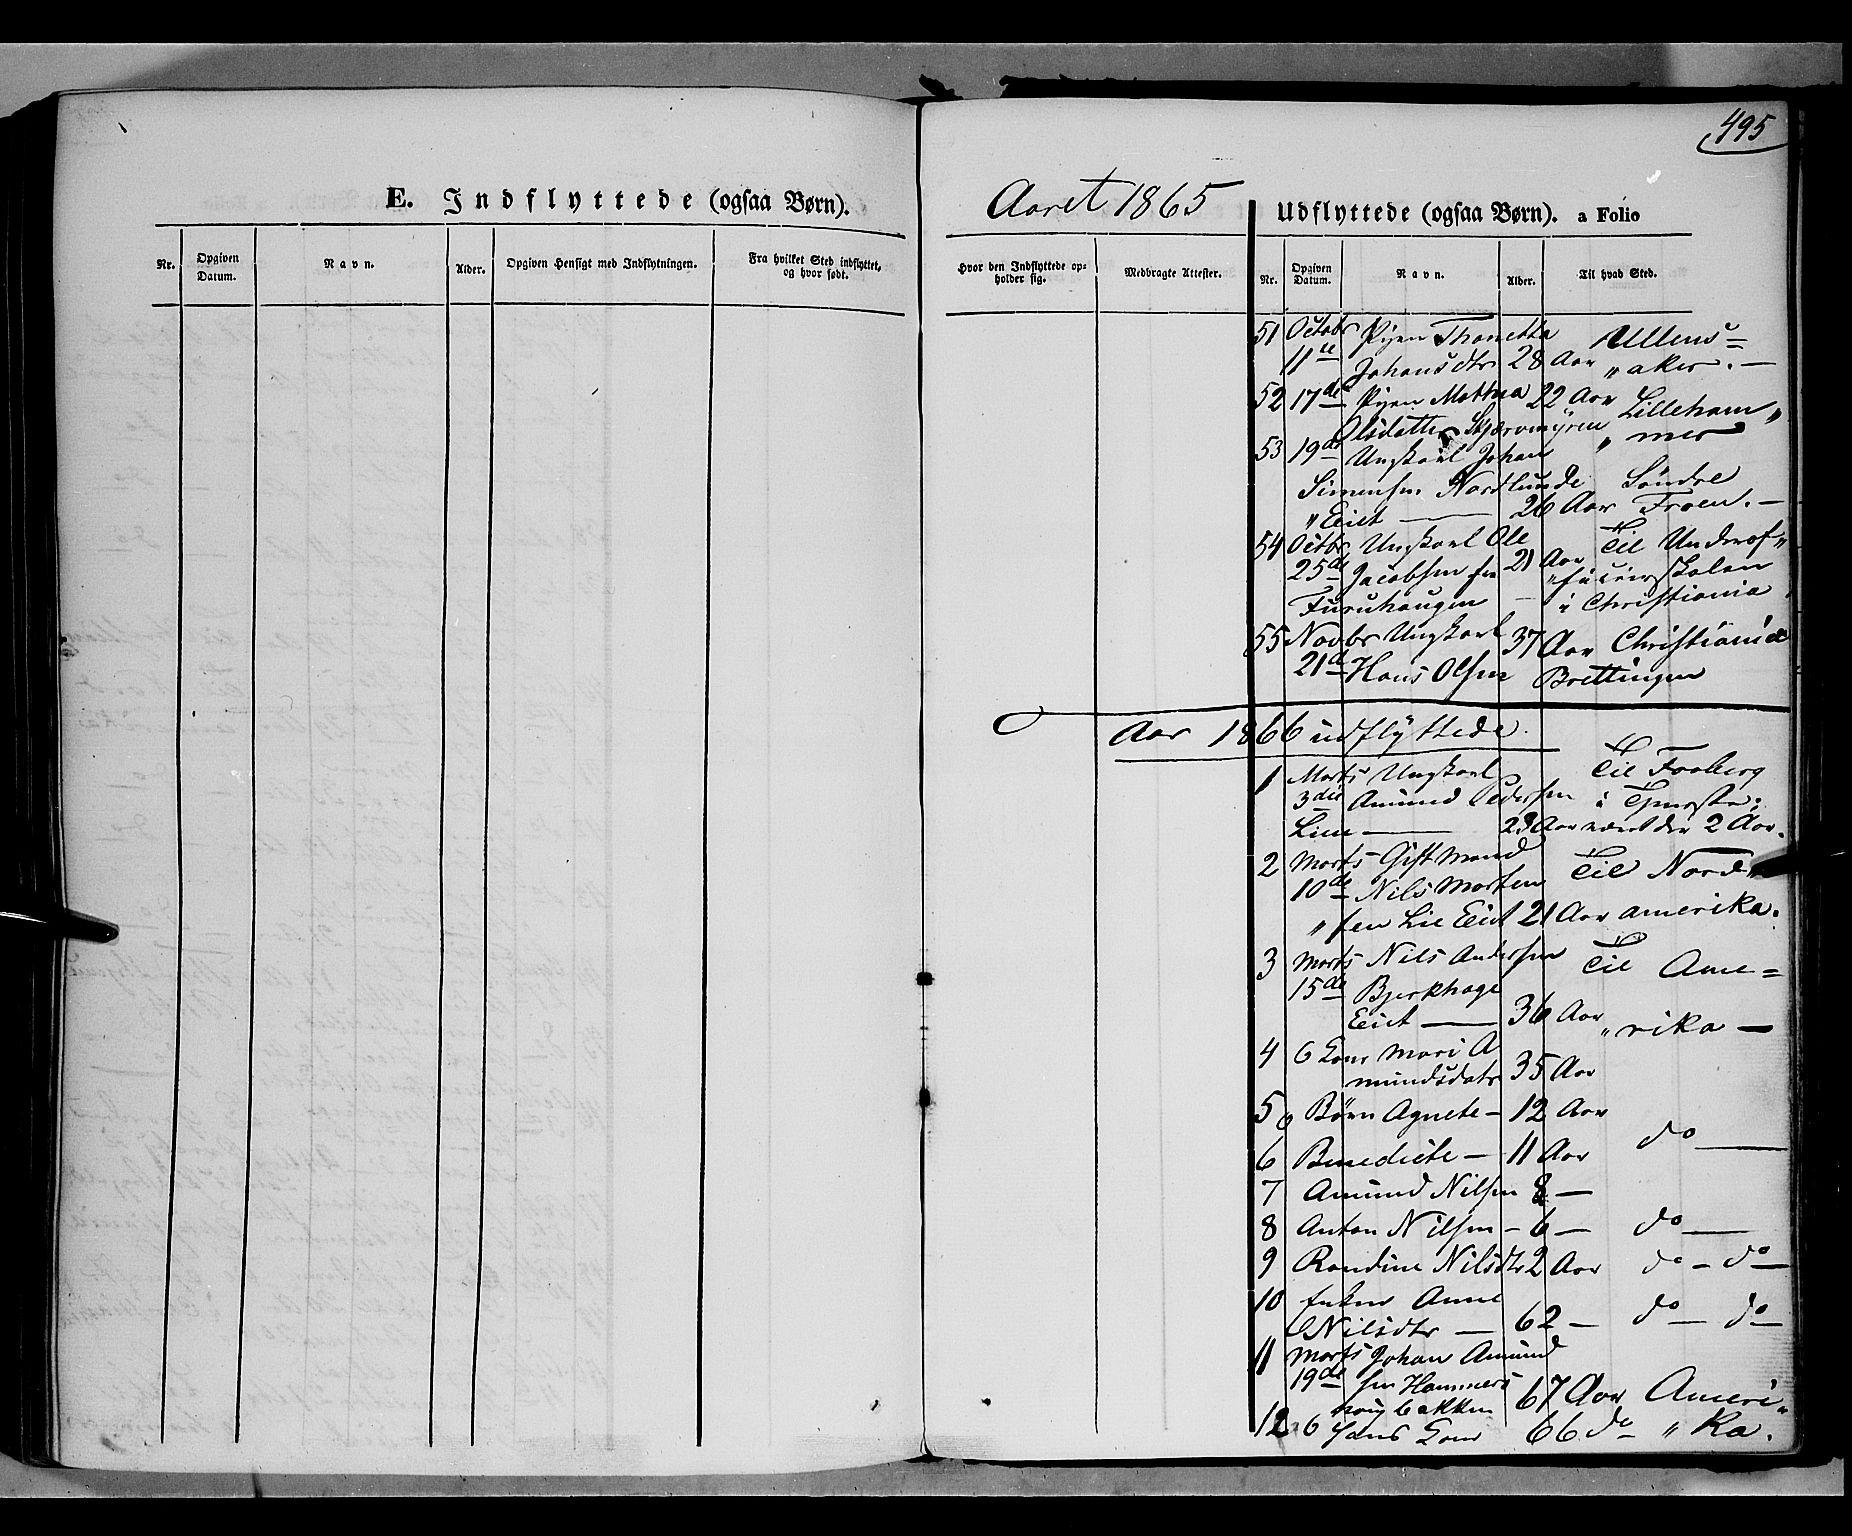 SAH, Gausdal prestekontor, Ministerialbok nr. 9, 1862-1873, s. 495